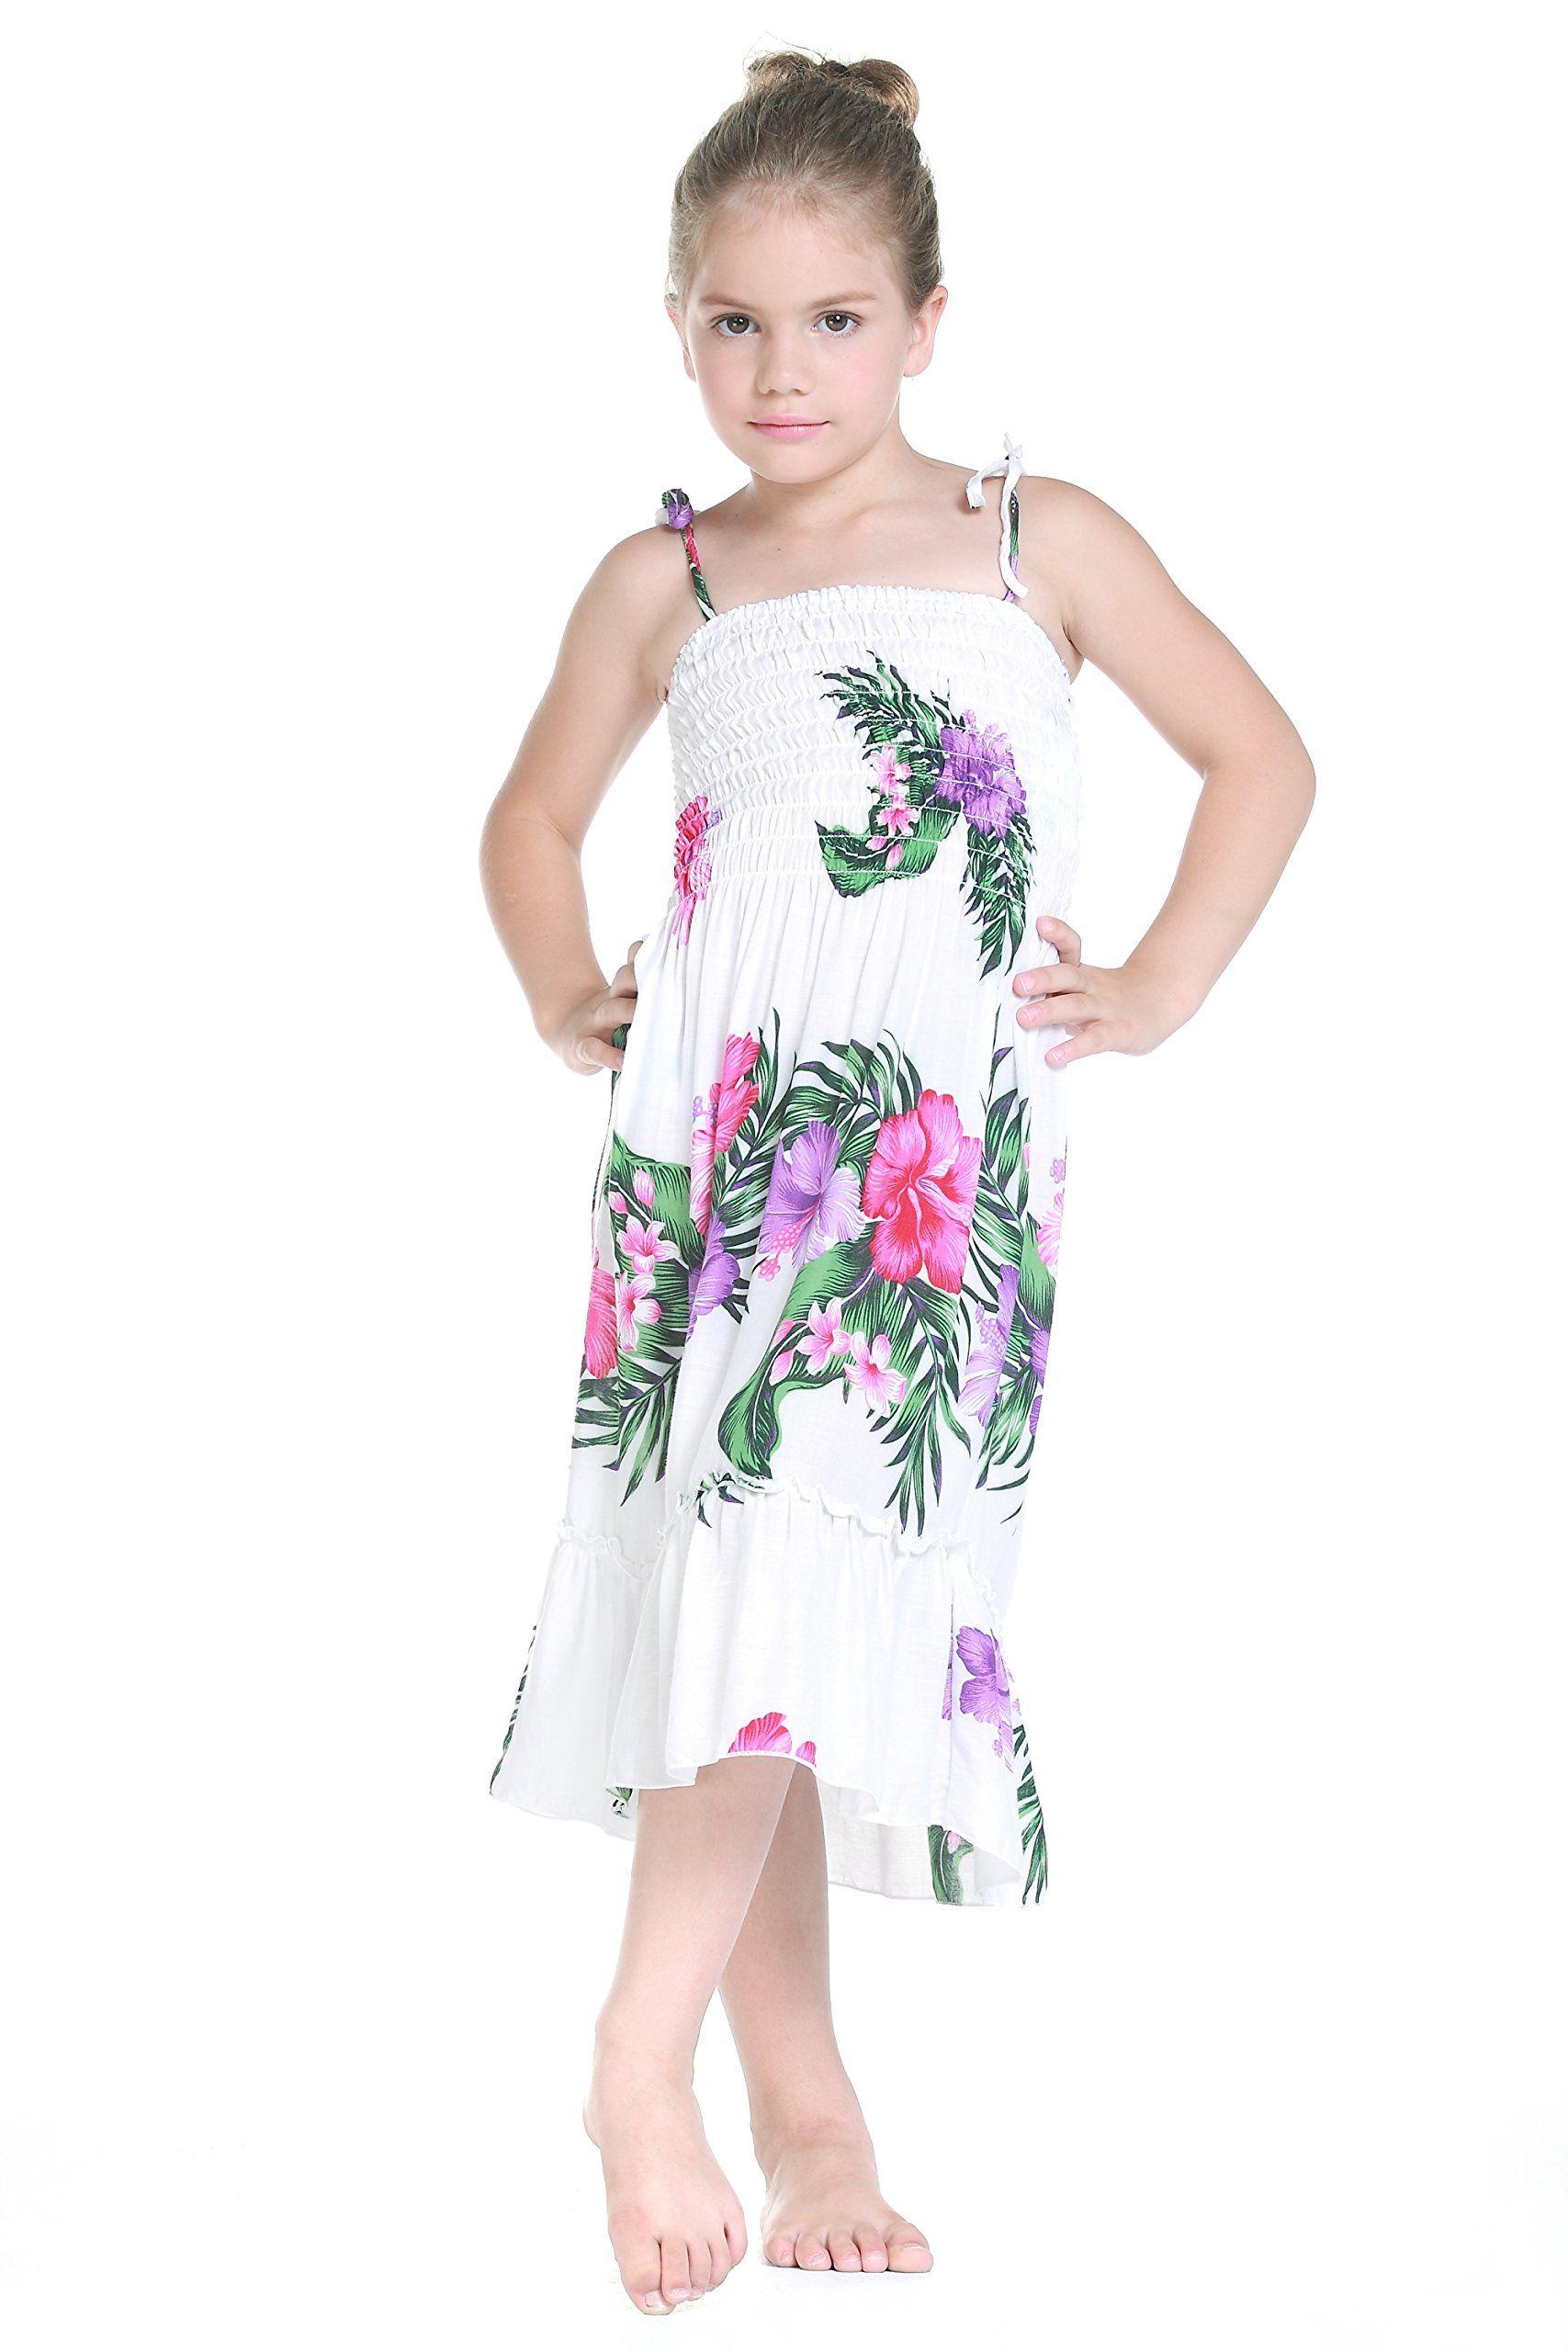 MADE IN HAWAII GIRL LUAU BEACH CRUISE ELASTIC STRAP DRESS Blue Plumeria Flower